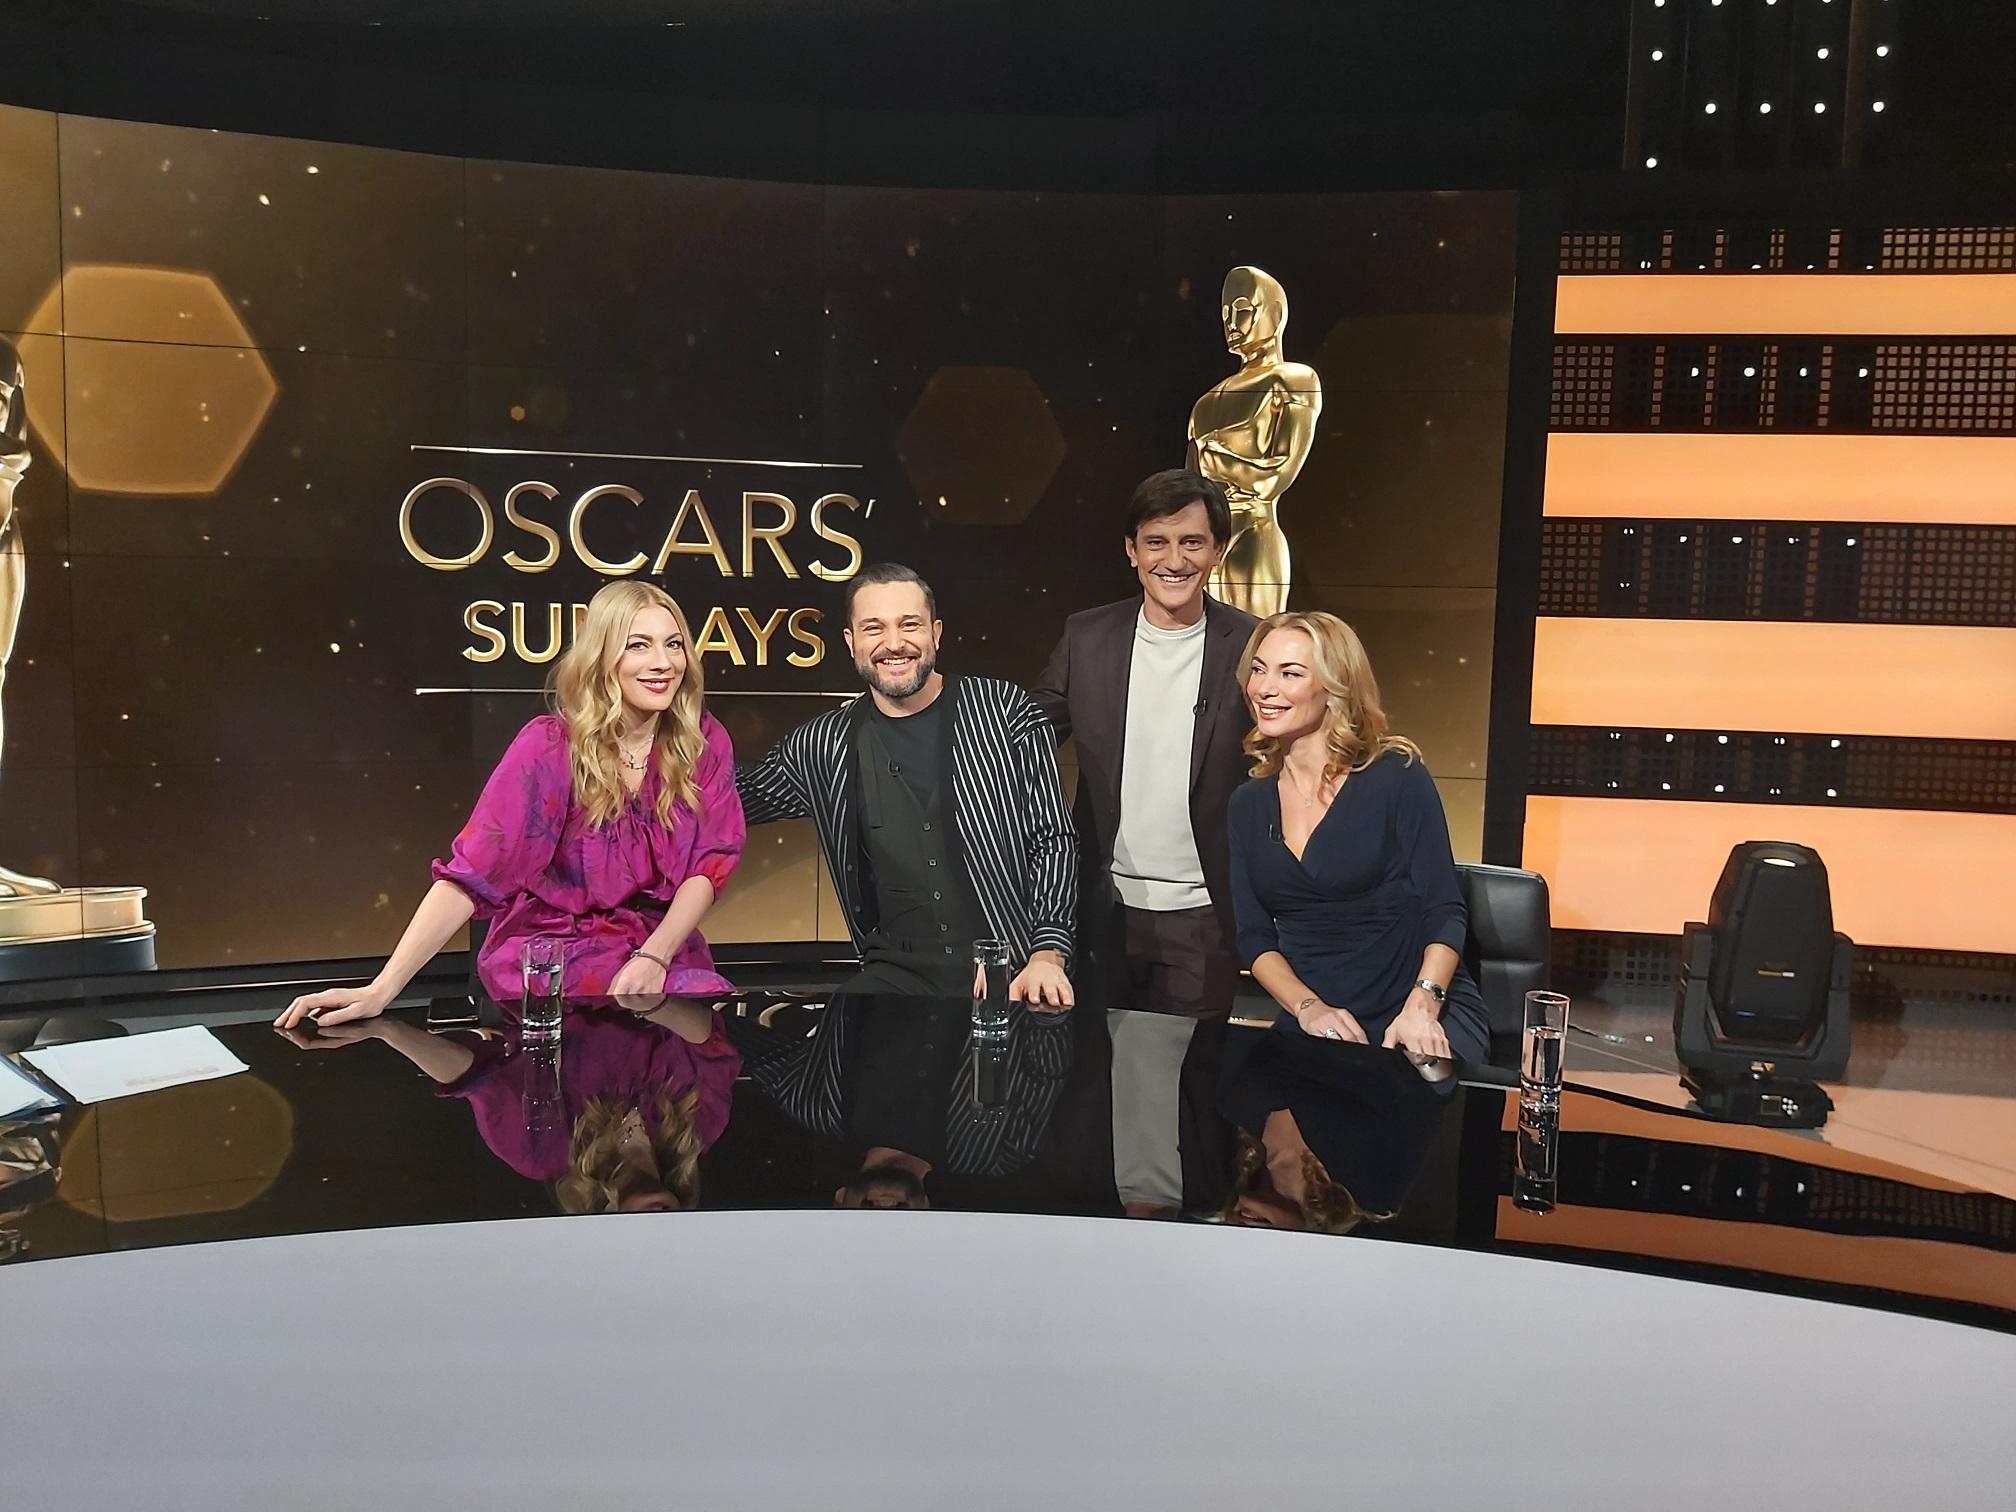 "COSMOTE TV: Ακόμα ένα ""OSCARS' Sundays"" με τον Θ. Κουτσογιαννόπουλο και νέες σεζόν για Project Blue Book και The Bold Type"